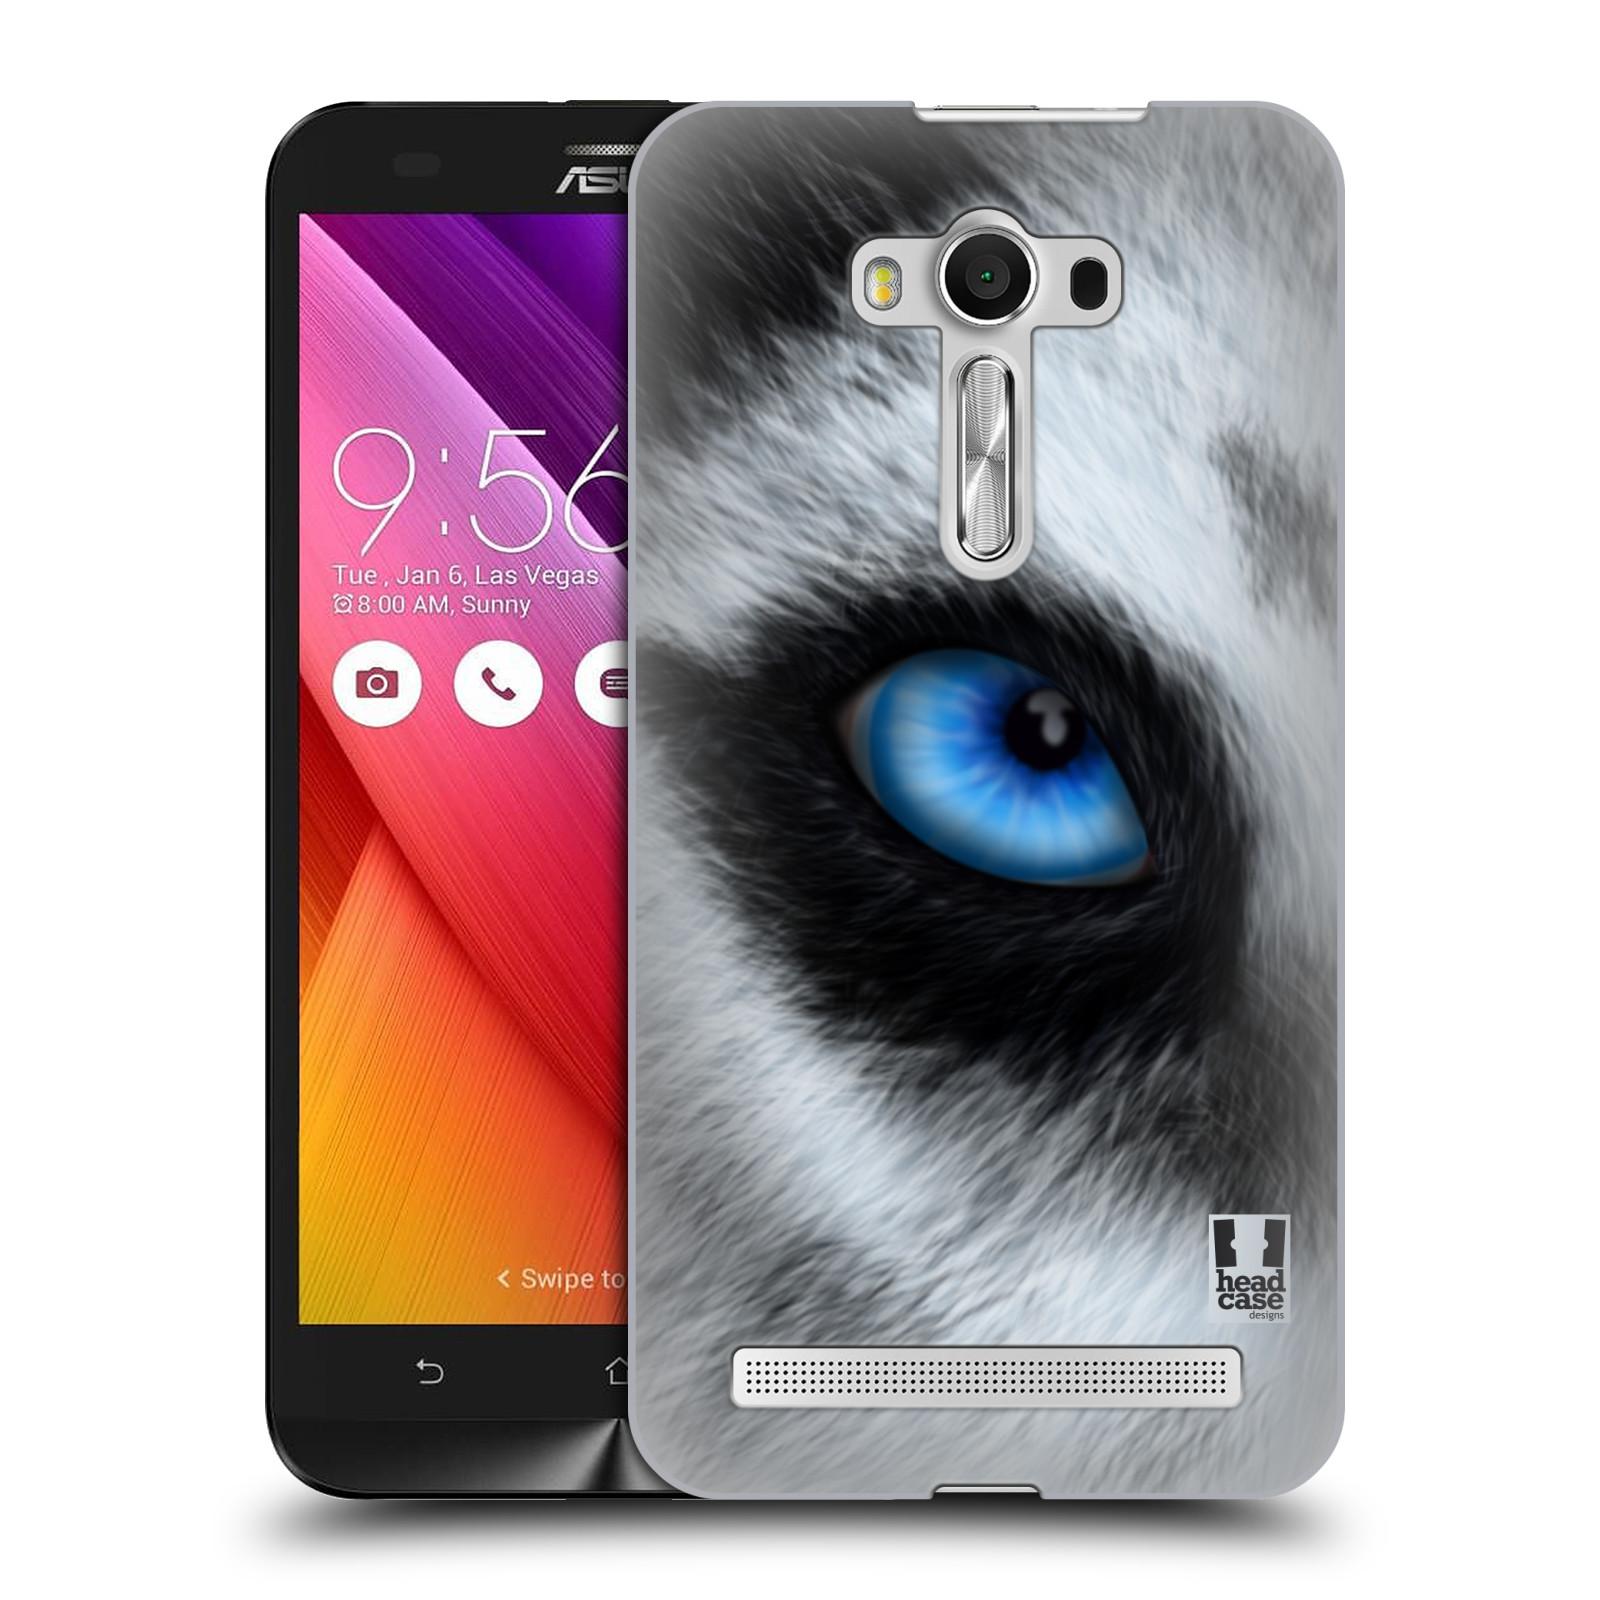 HEAD CASE plastový obal na mobil Asus Zenfone 2 LASER (5,5 displej ZE550KL) vzor pohled zvířete oko pes husky